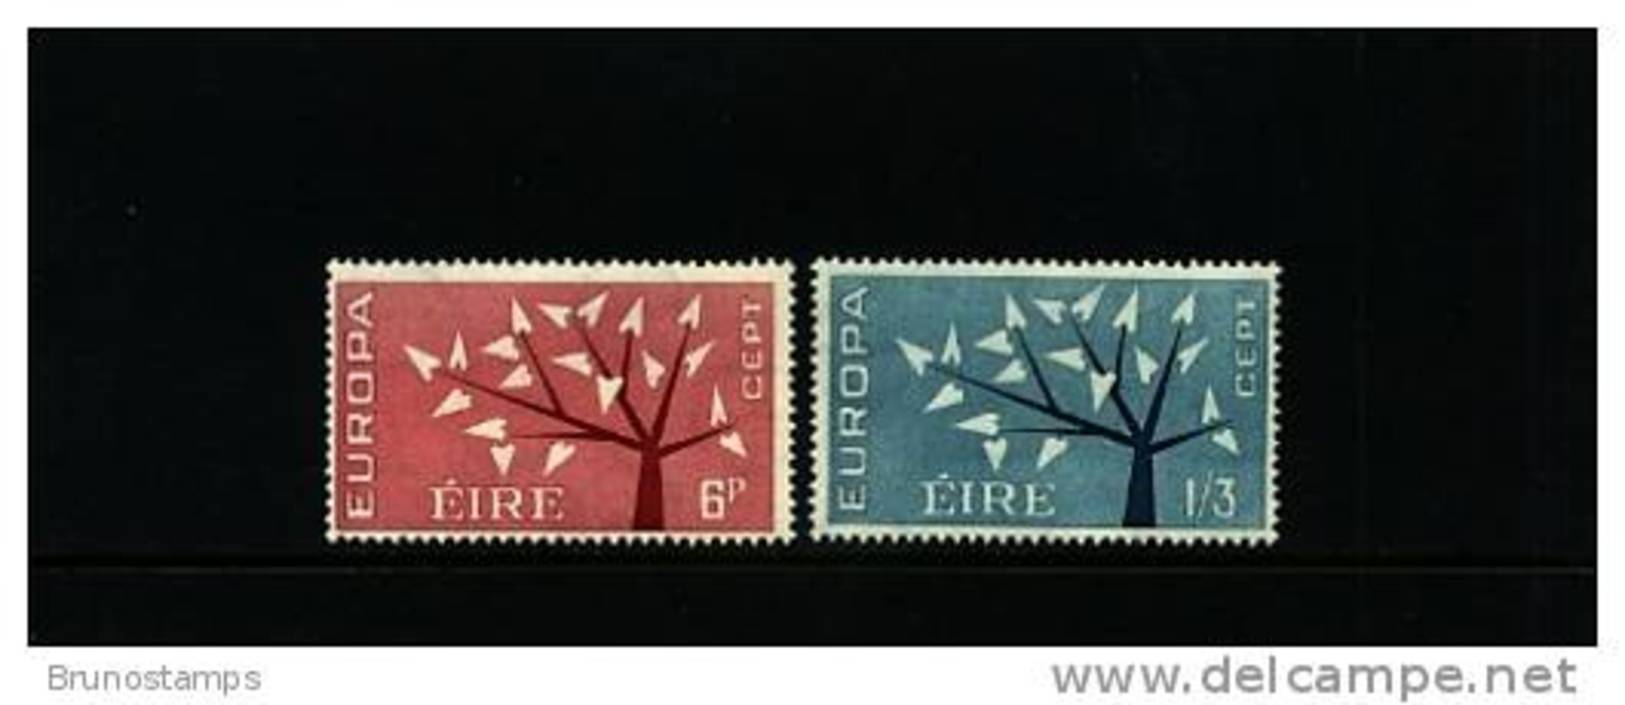 IRELAND/EIRE - 1962  EUROPA   SET MINT NH - 1949-... Repubblica D'Irlanda